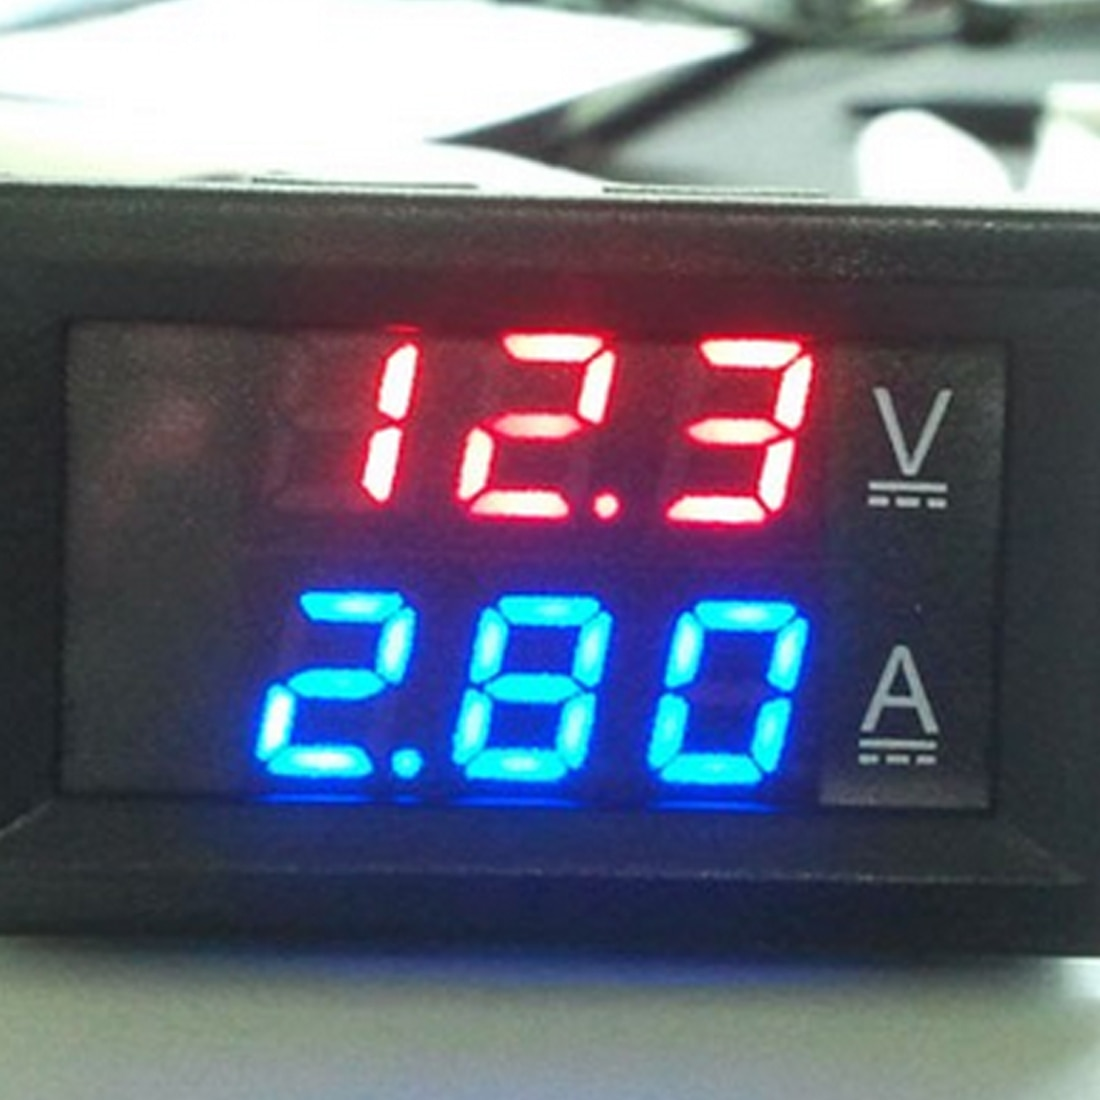 "Mini Digital voltímetro amperímetro DC 100V 10A Panel Amp voltios medidor de corriente de voltaje de 0,56 ""Azul Rojo de doble LED pantalla"